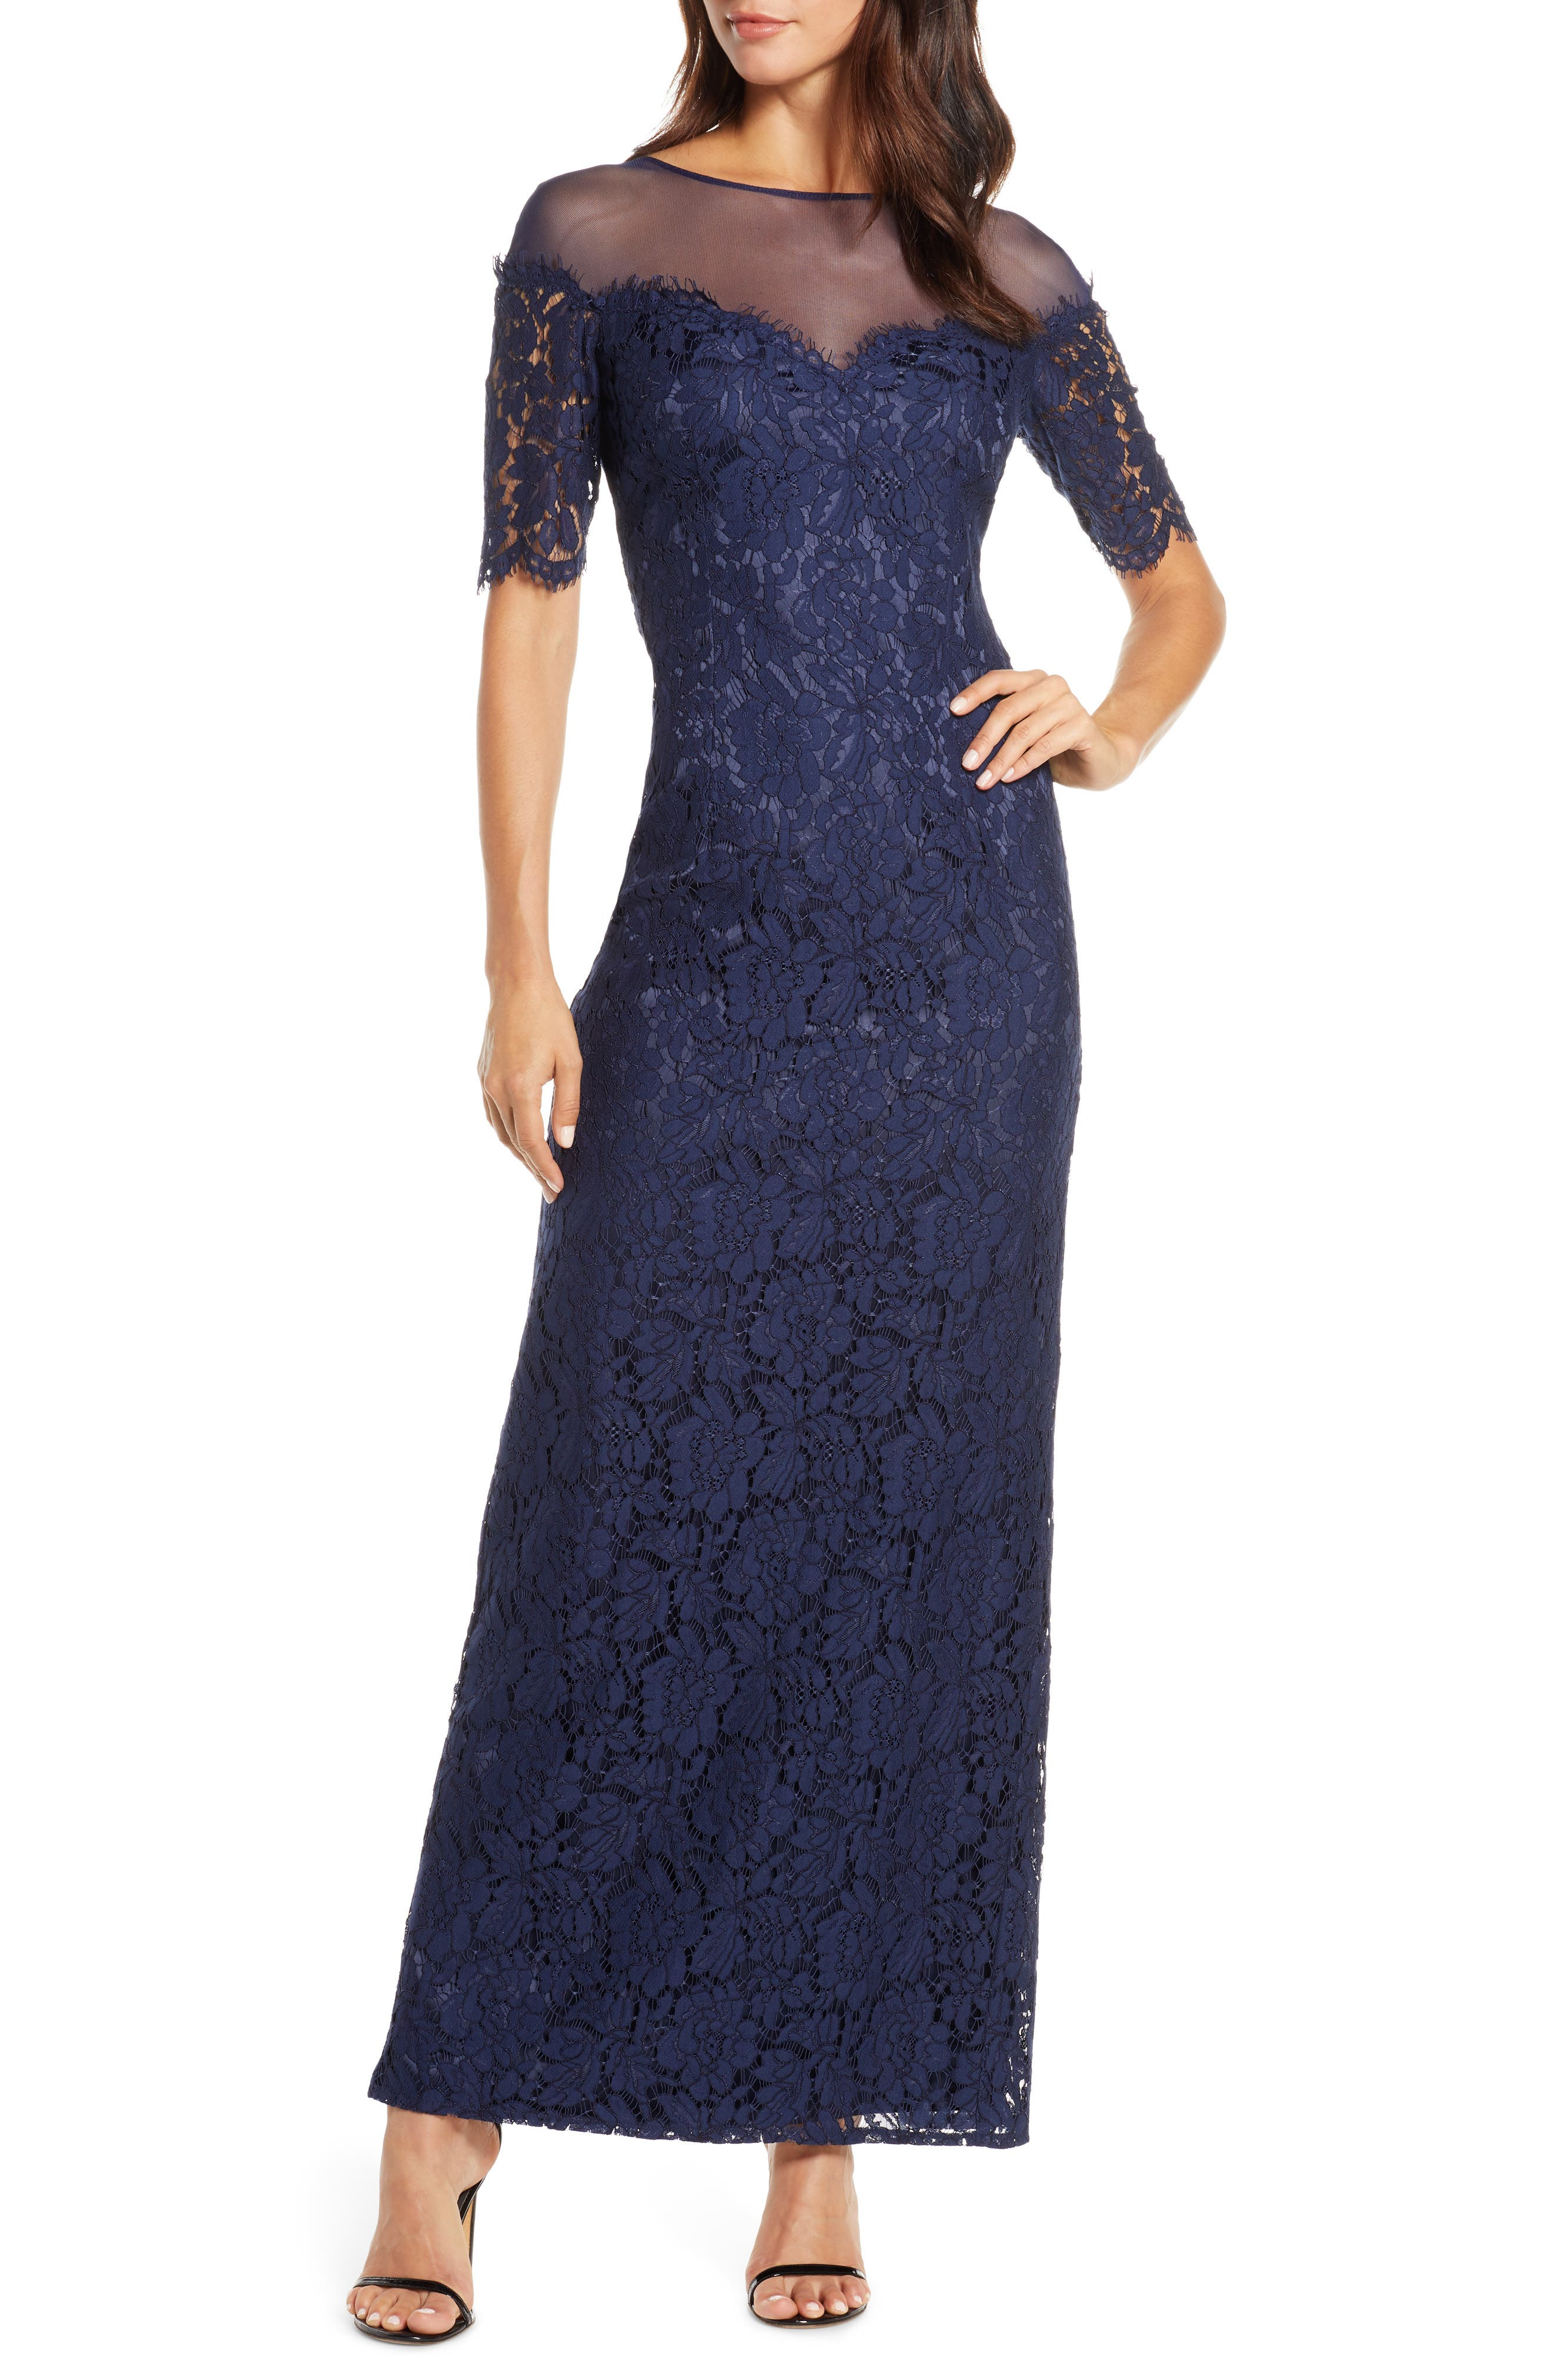 Eliza J Illusion Top Lace Evening Gown (Regular, Petite & Plus Size)